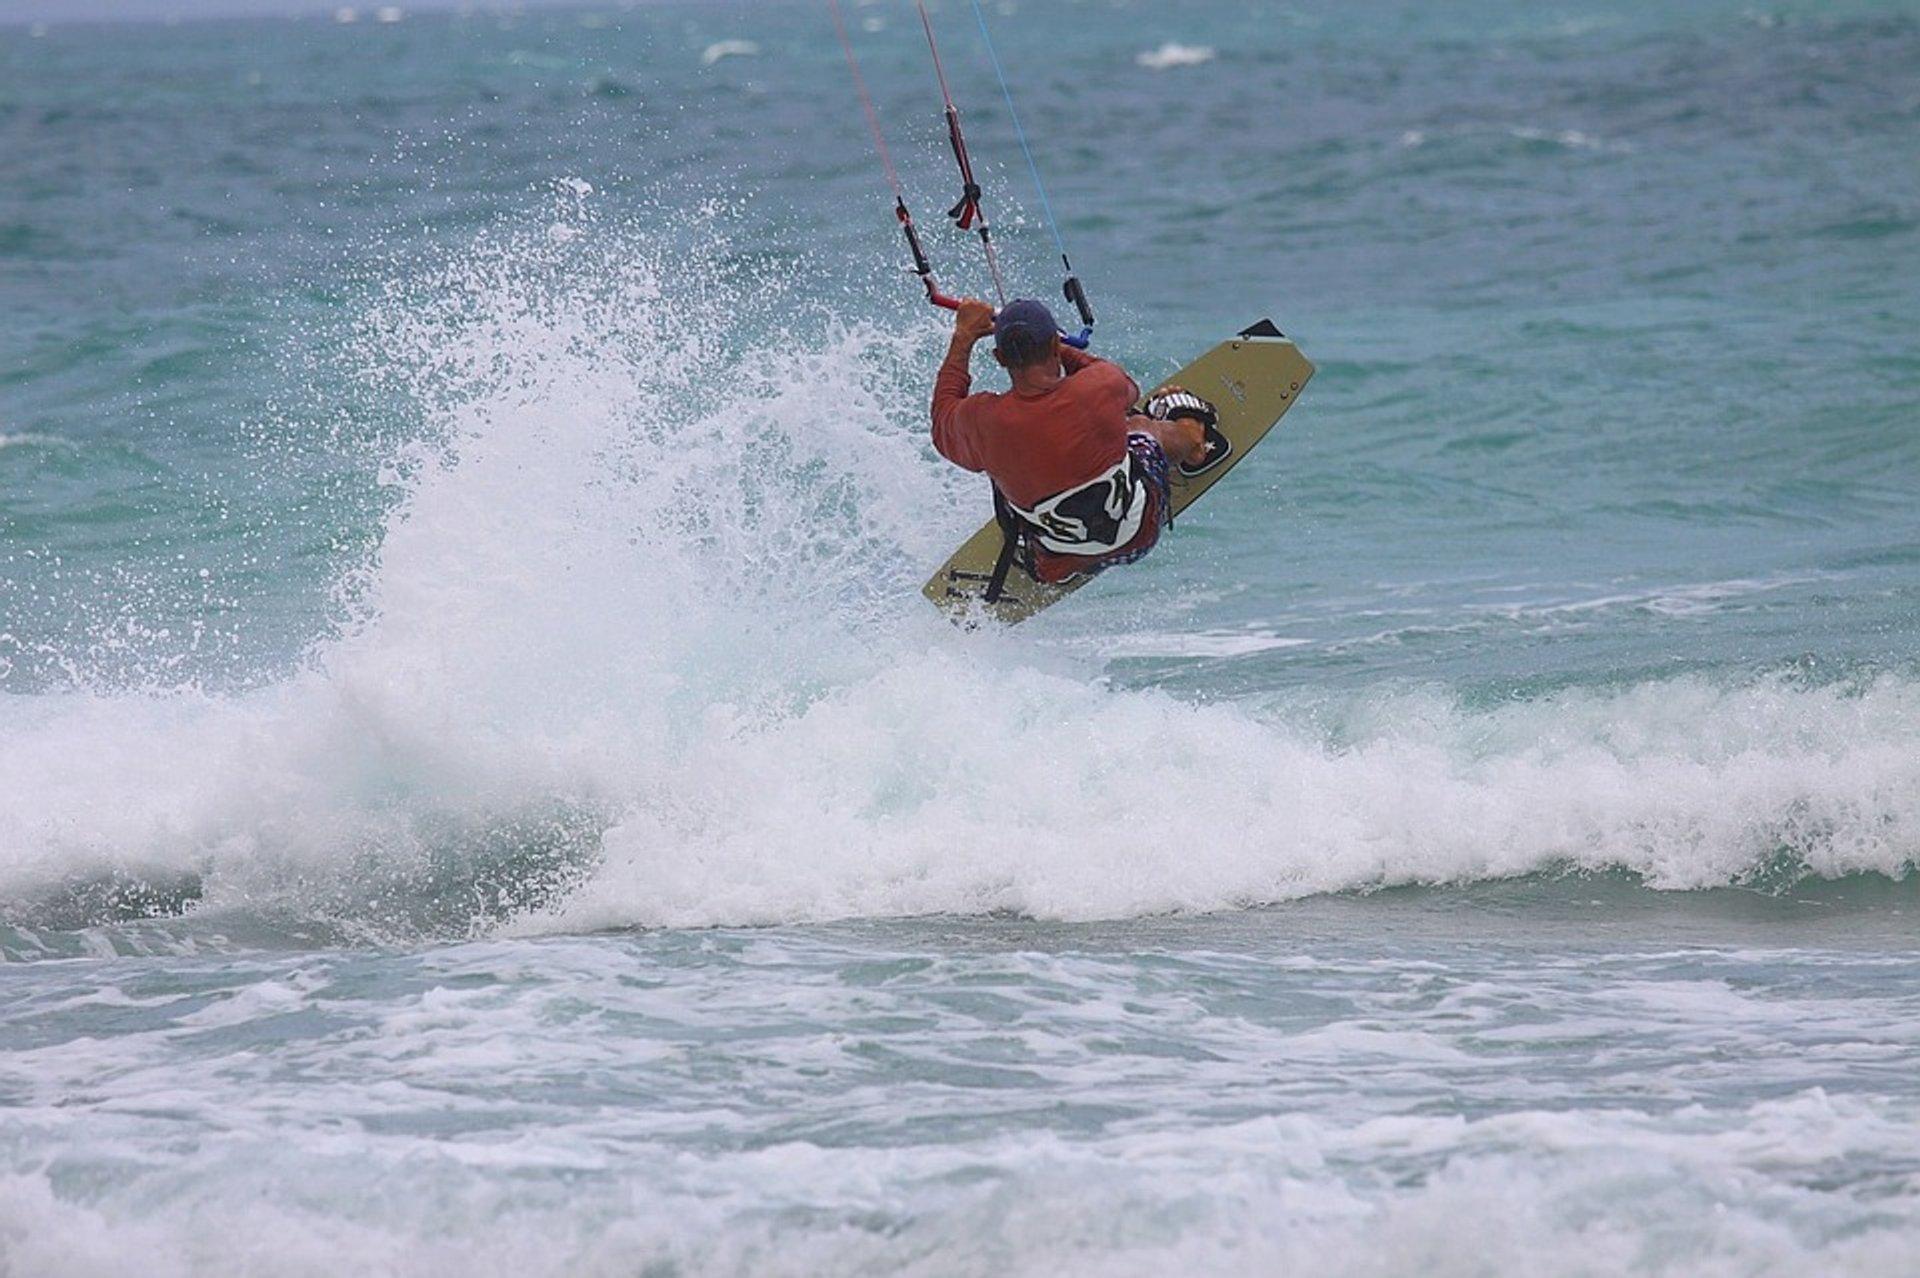 Kiteboarding in Florida 2020